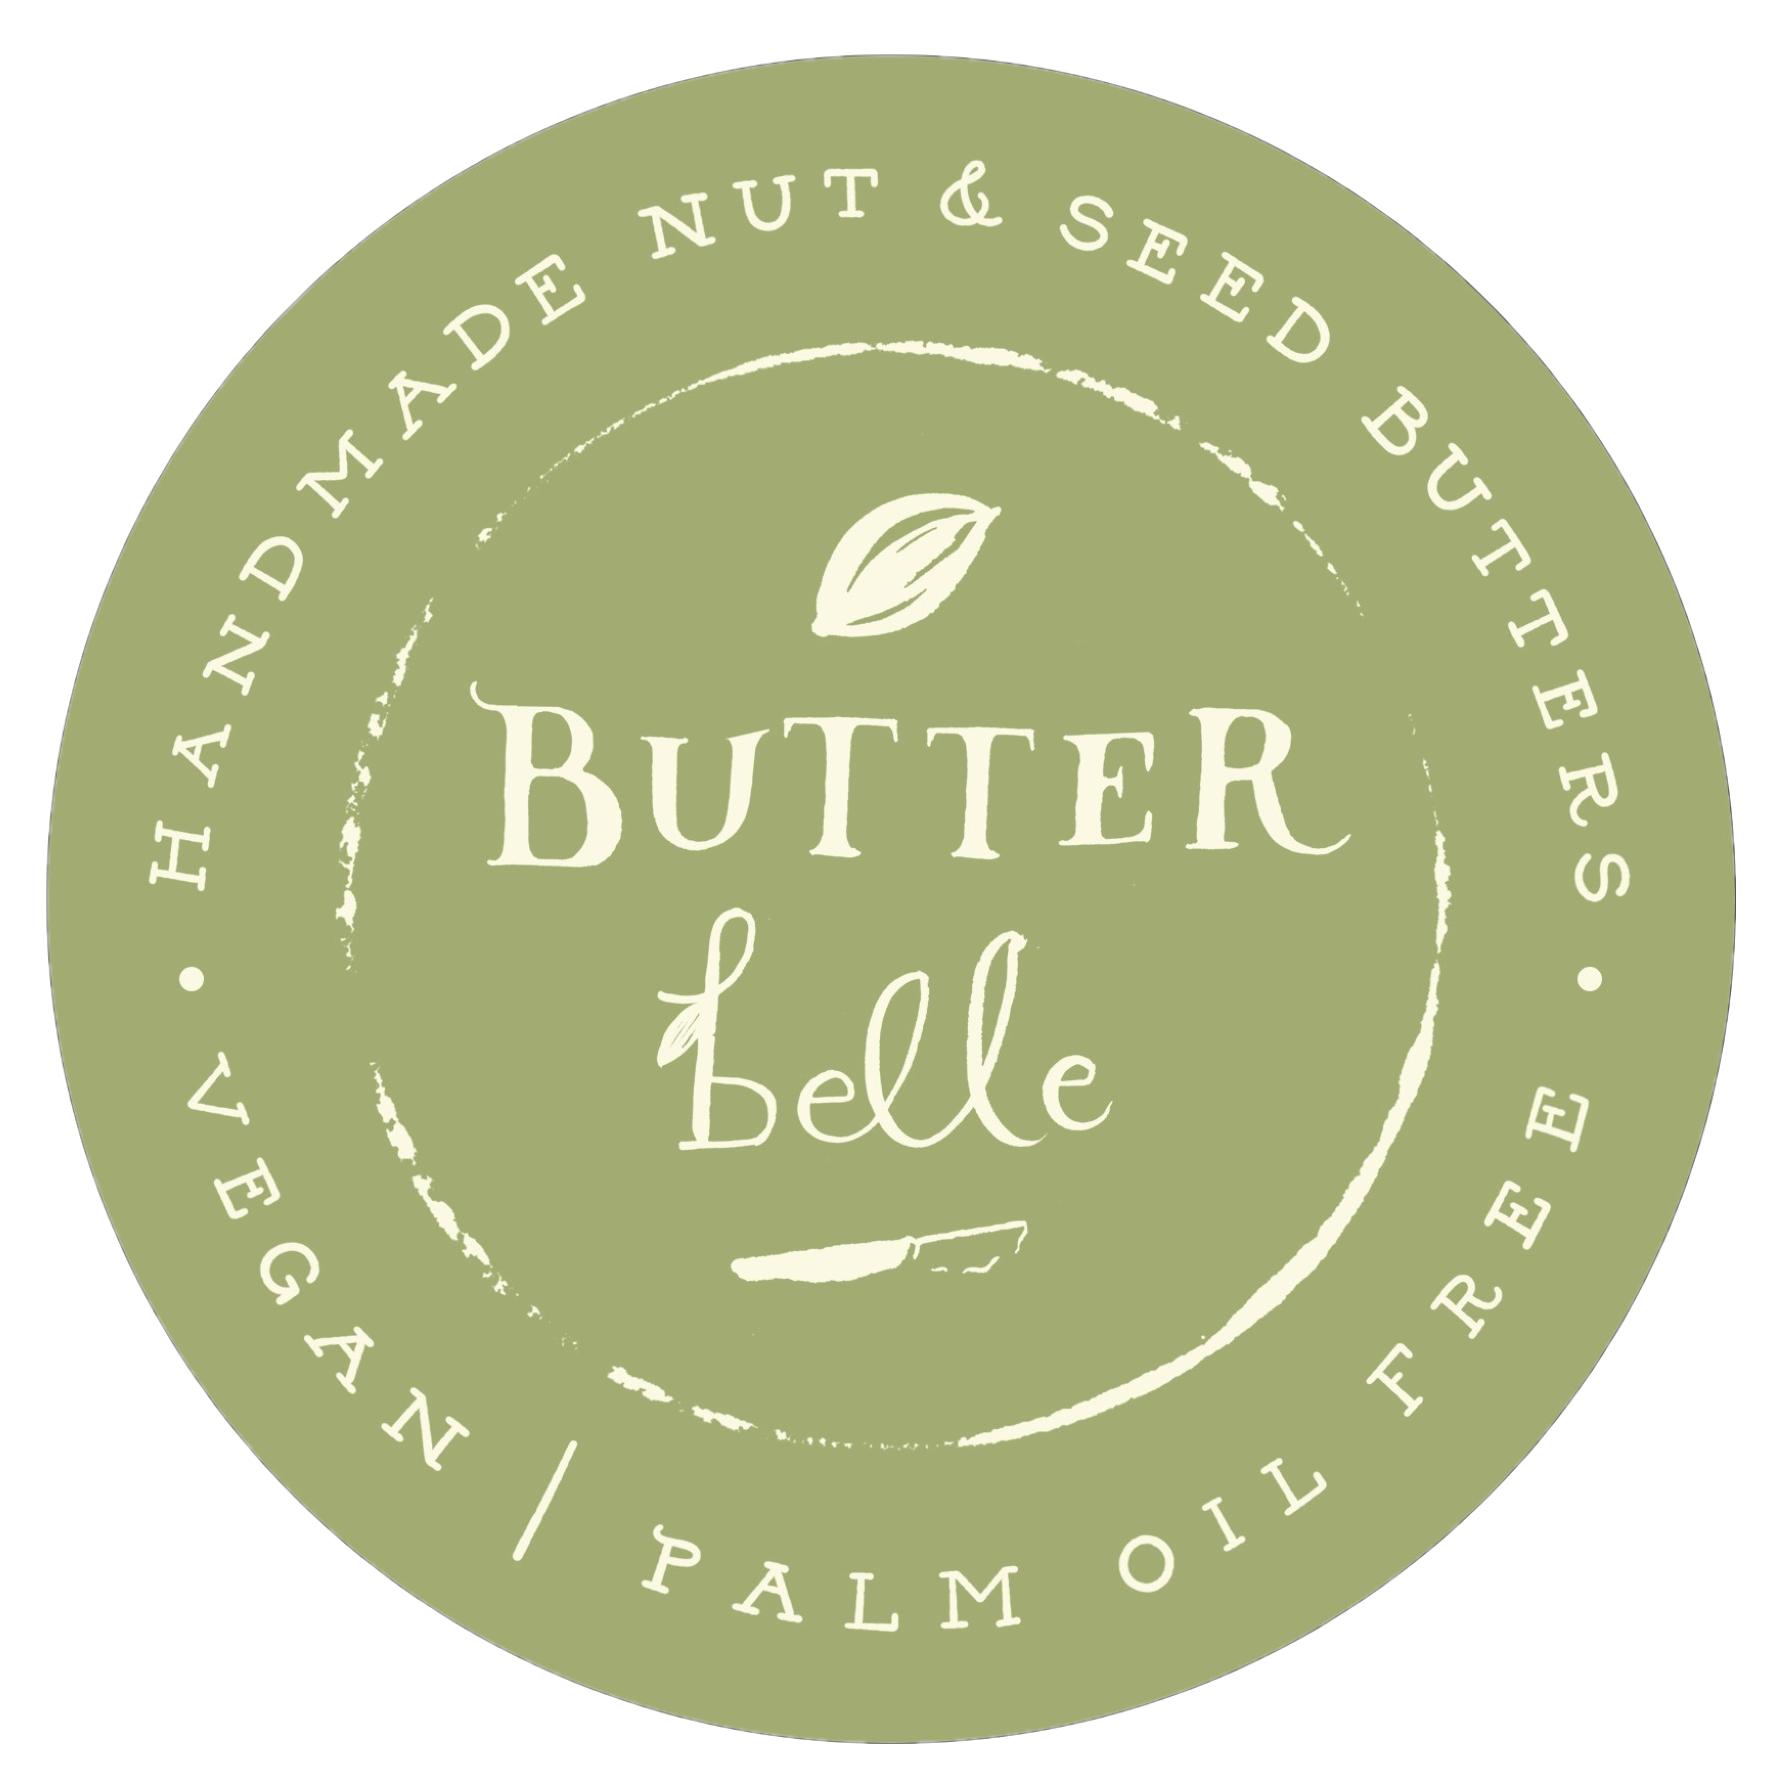 Butterbelle